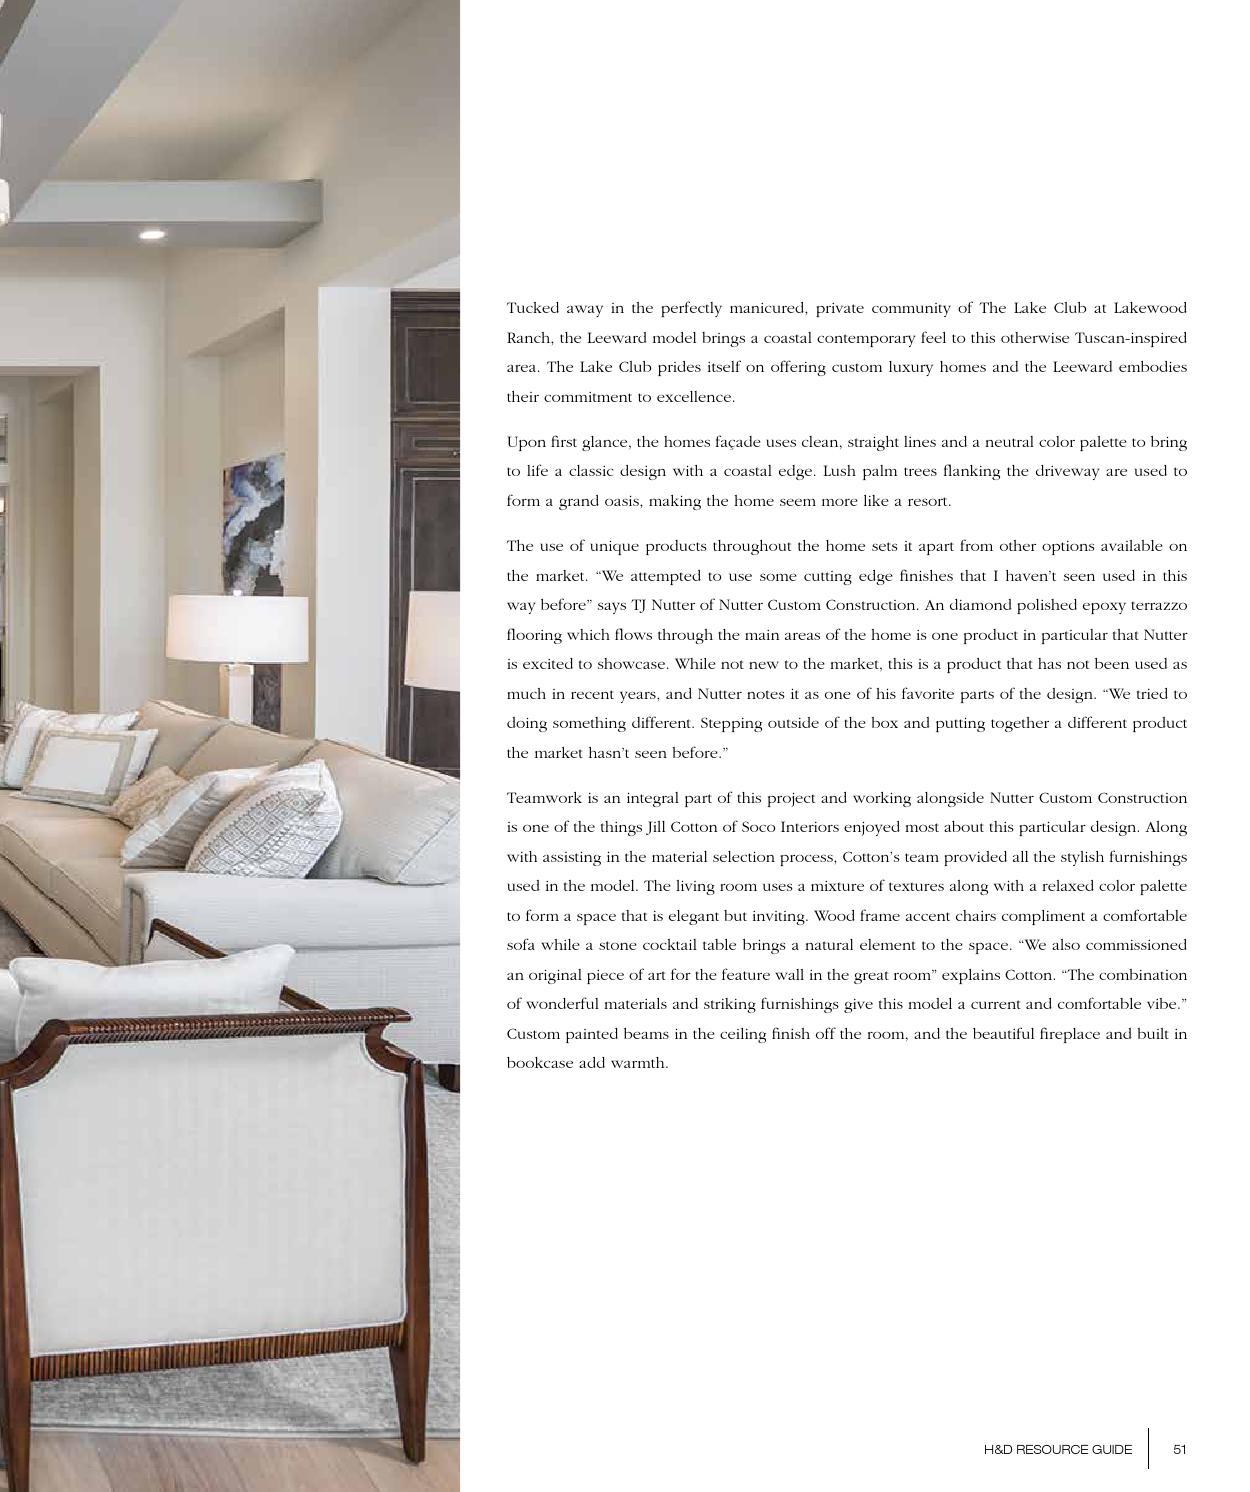 Home And Design Magazine Suncoast Edition. Home. Free Photos For ...